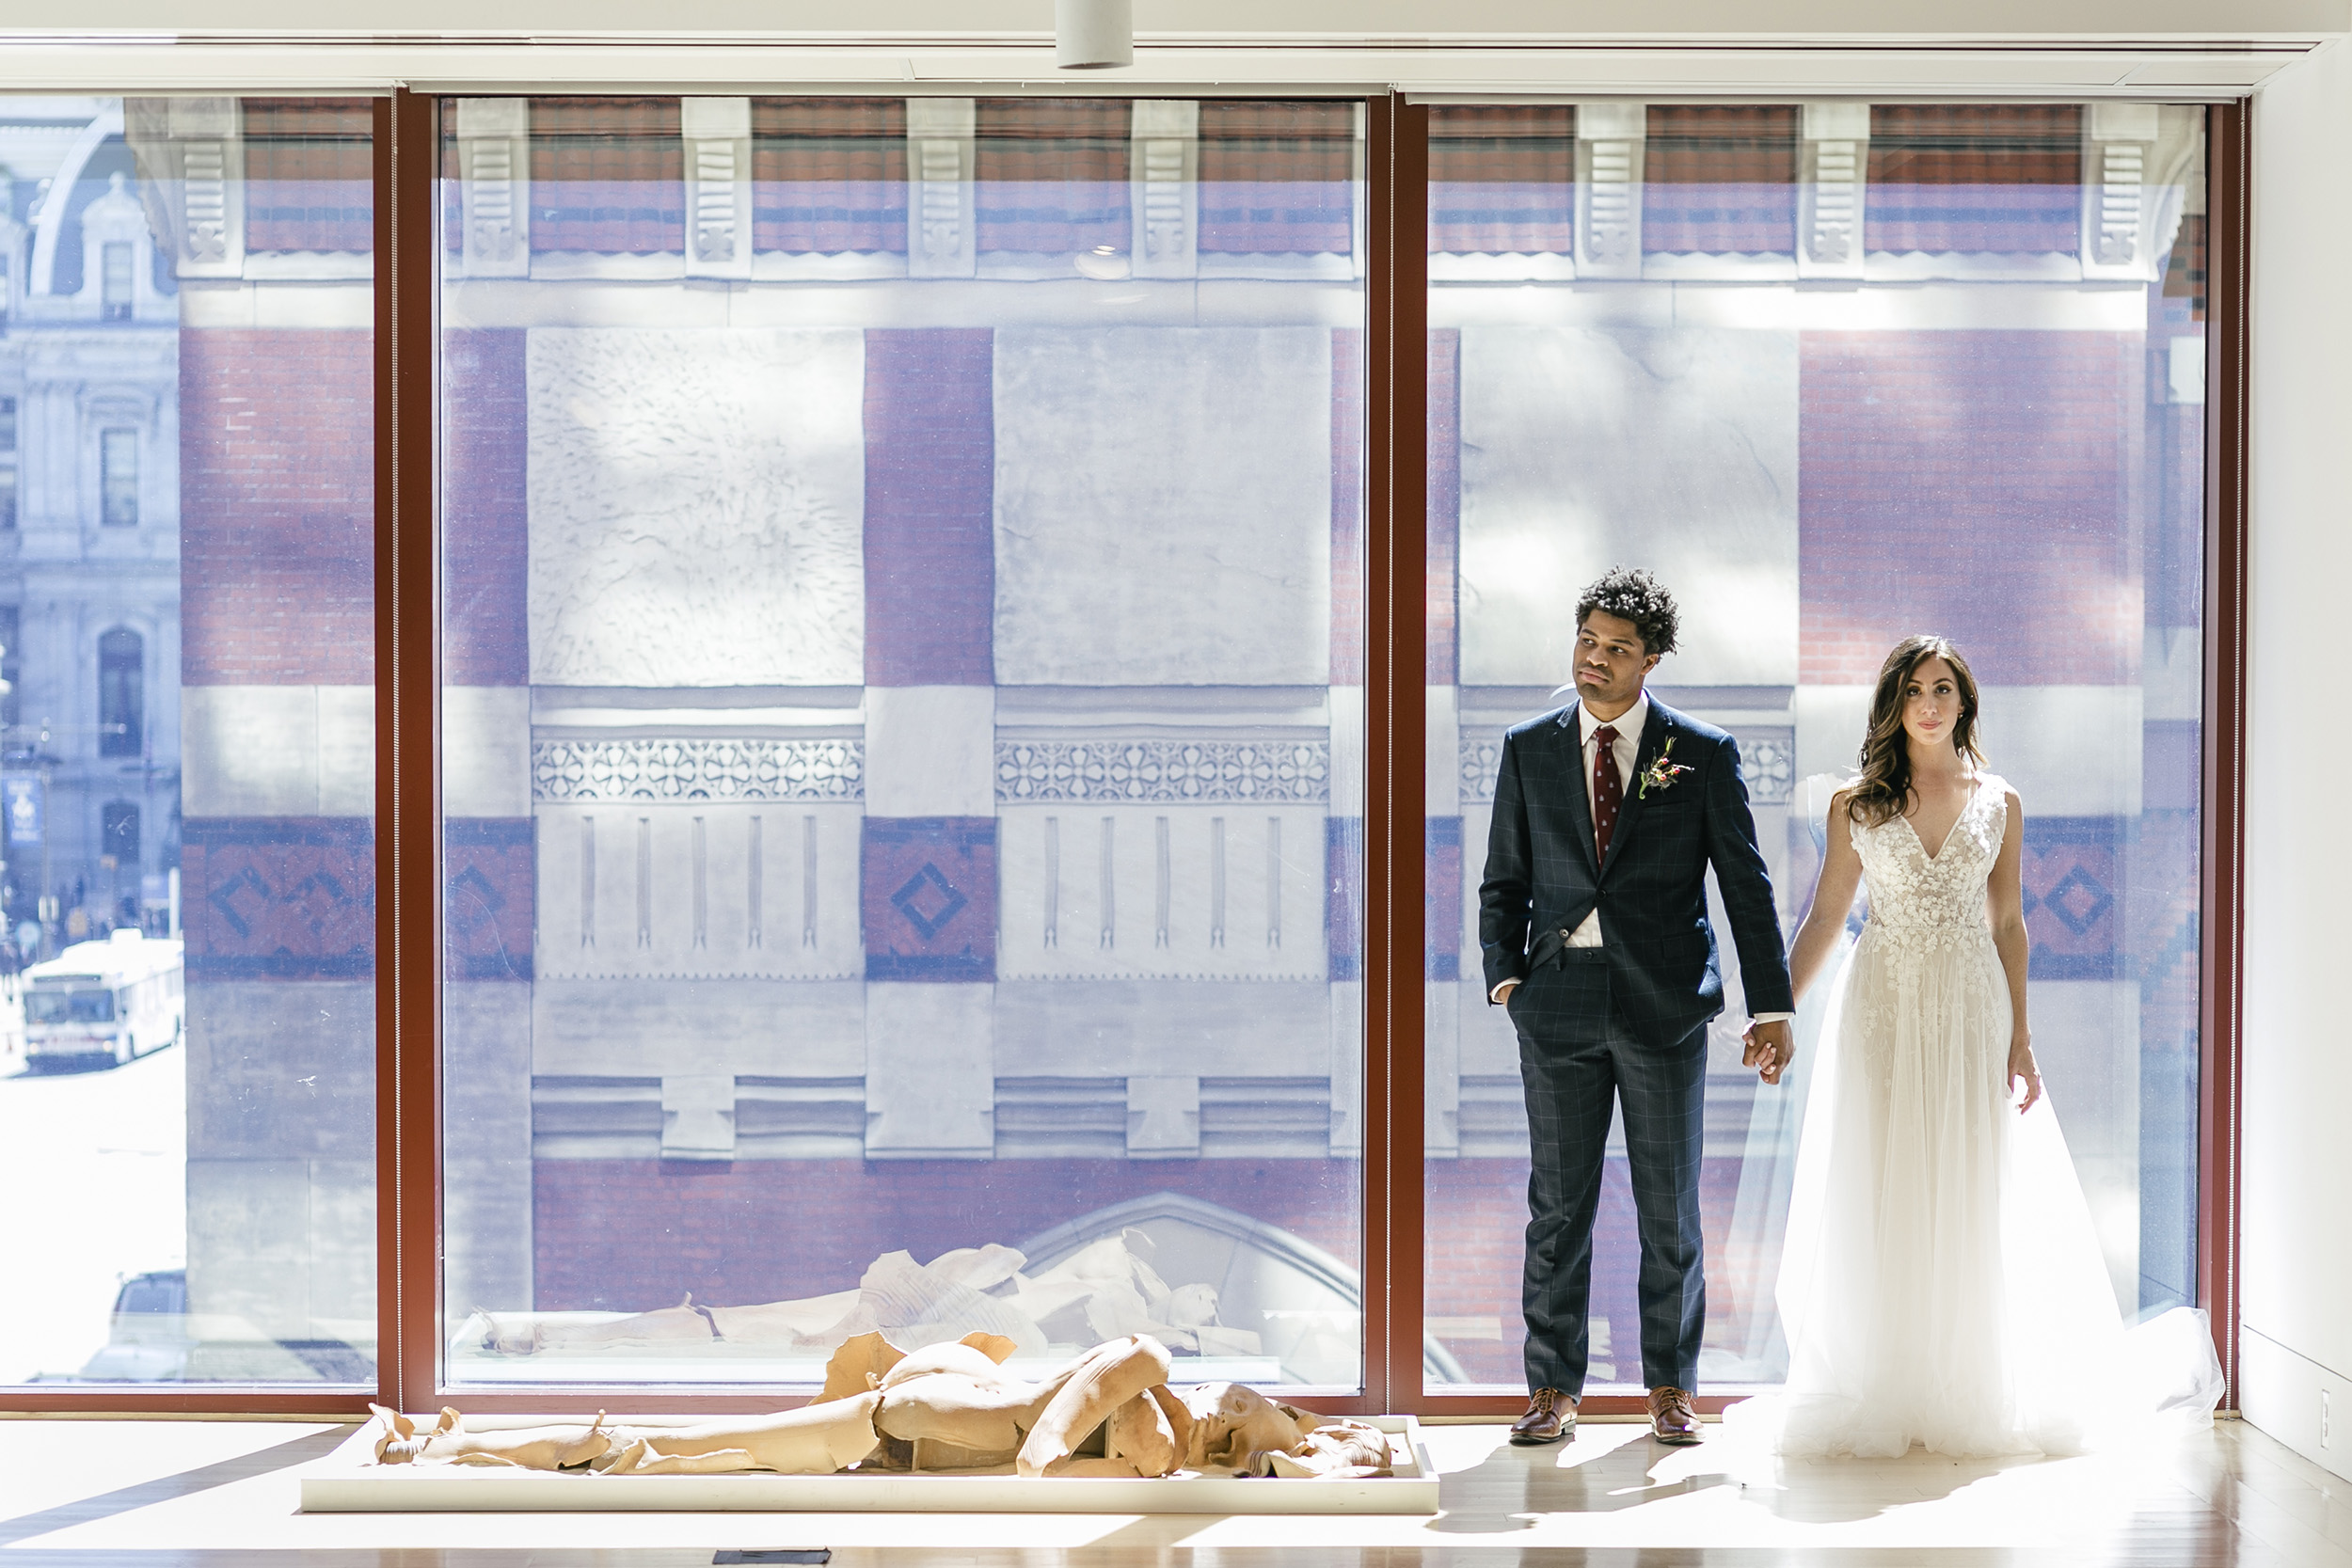 photography-wedding-weddings-natural-candid-pafa-pennsylvania academy-philadephia-philly-philadelphia wedding-mixed race-editorial-modern-fine-art-004.JPG